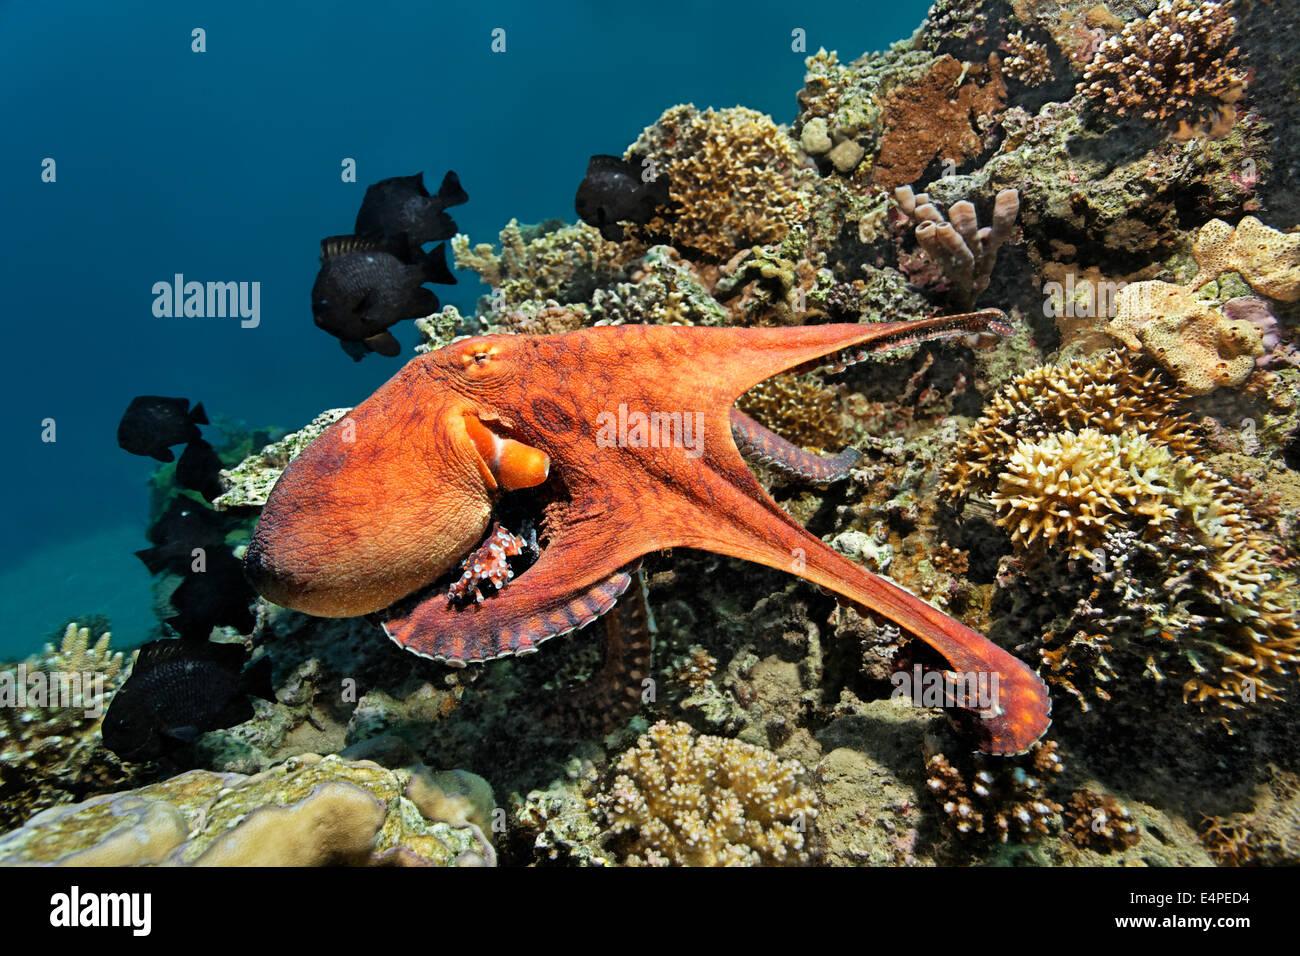 Gemeinsame Krake (Octopus Vulgaris), an einem Korallenriff, Rotes Meer, Ägypten Stockbild